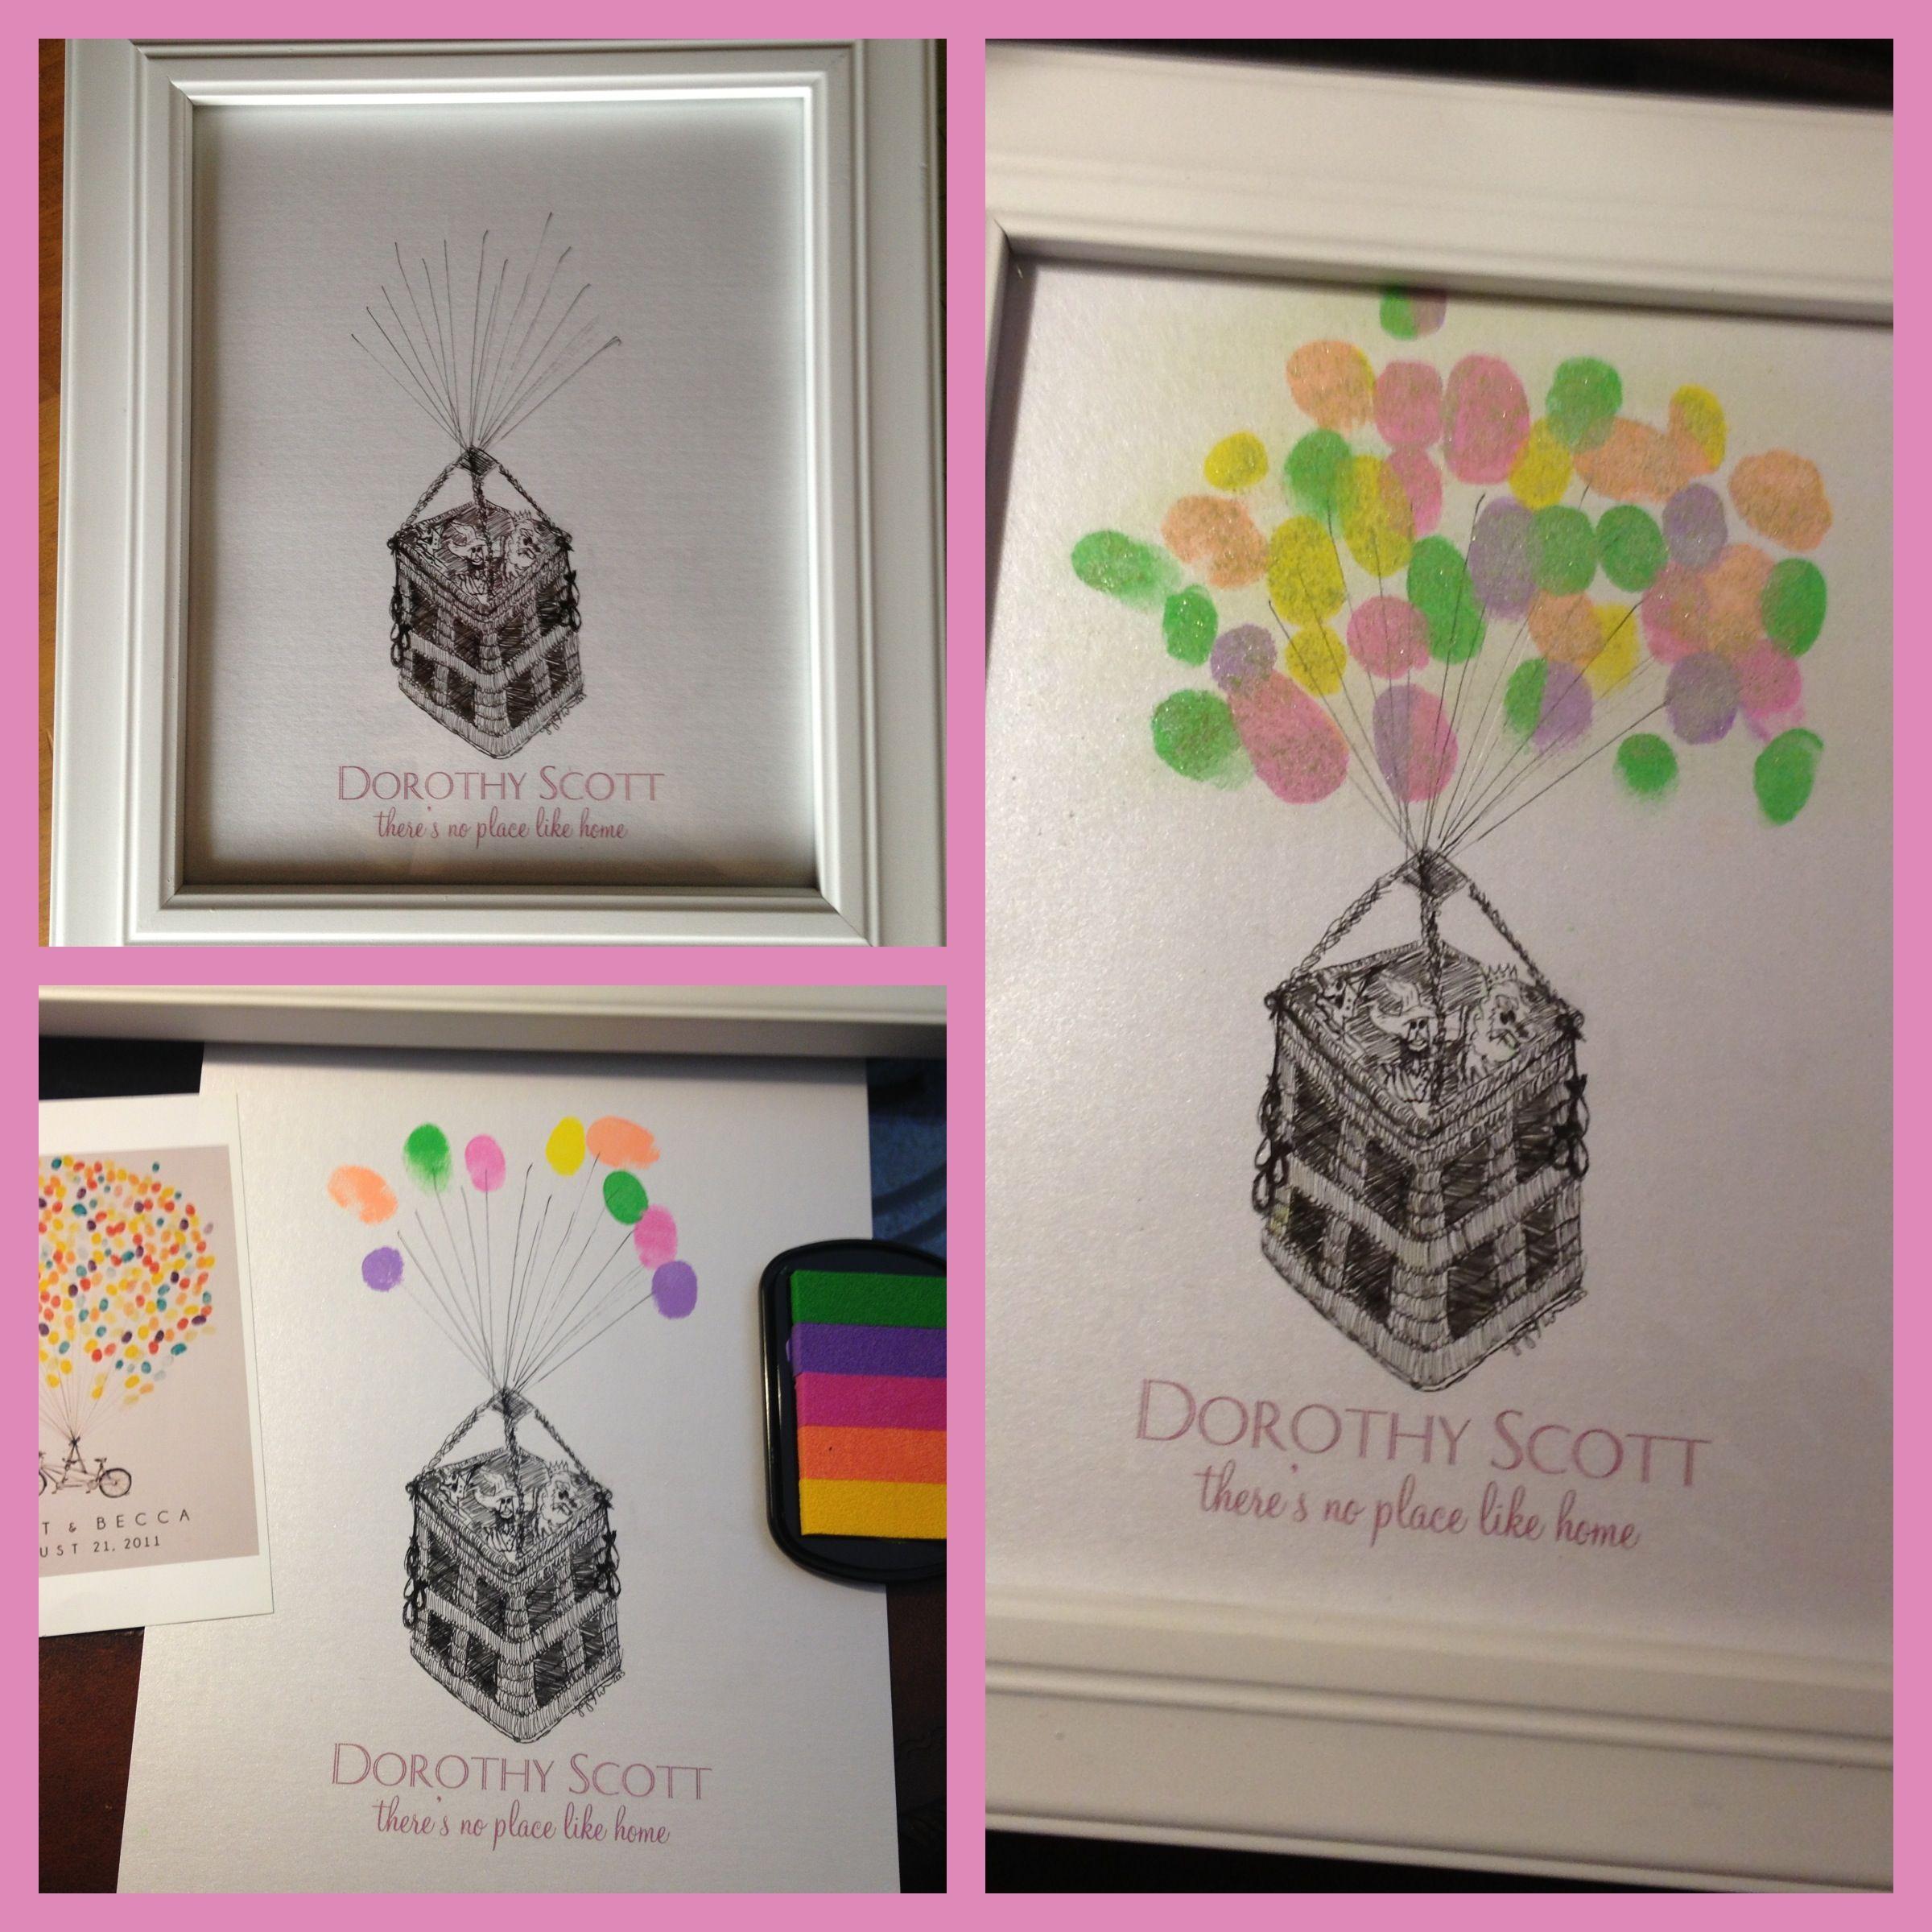 DIY Baby Shower Gift or DIY Wedding Guest Book or Bridal Shower Gift